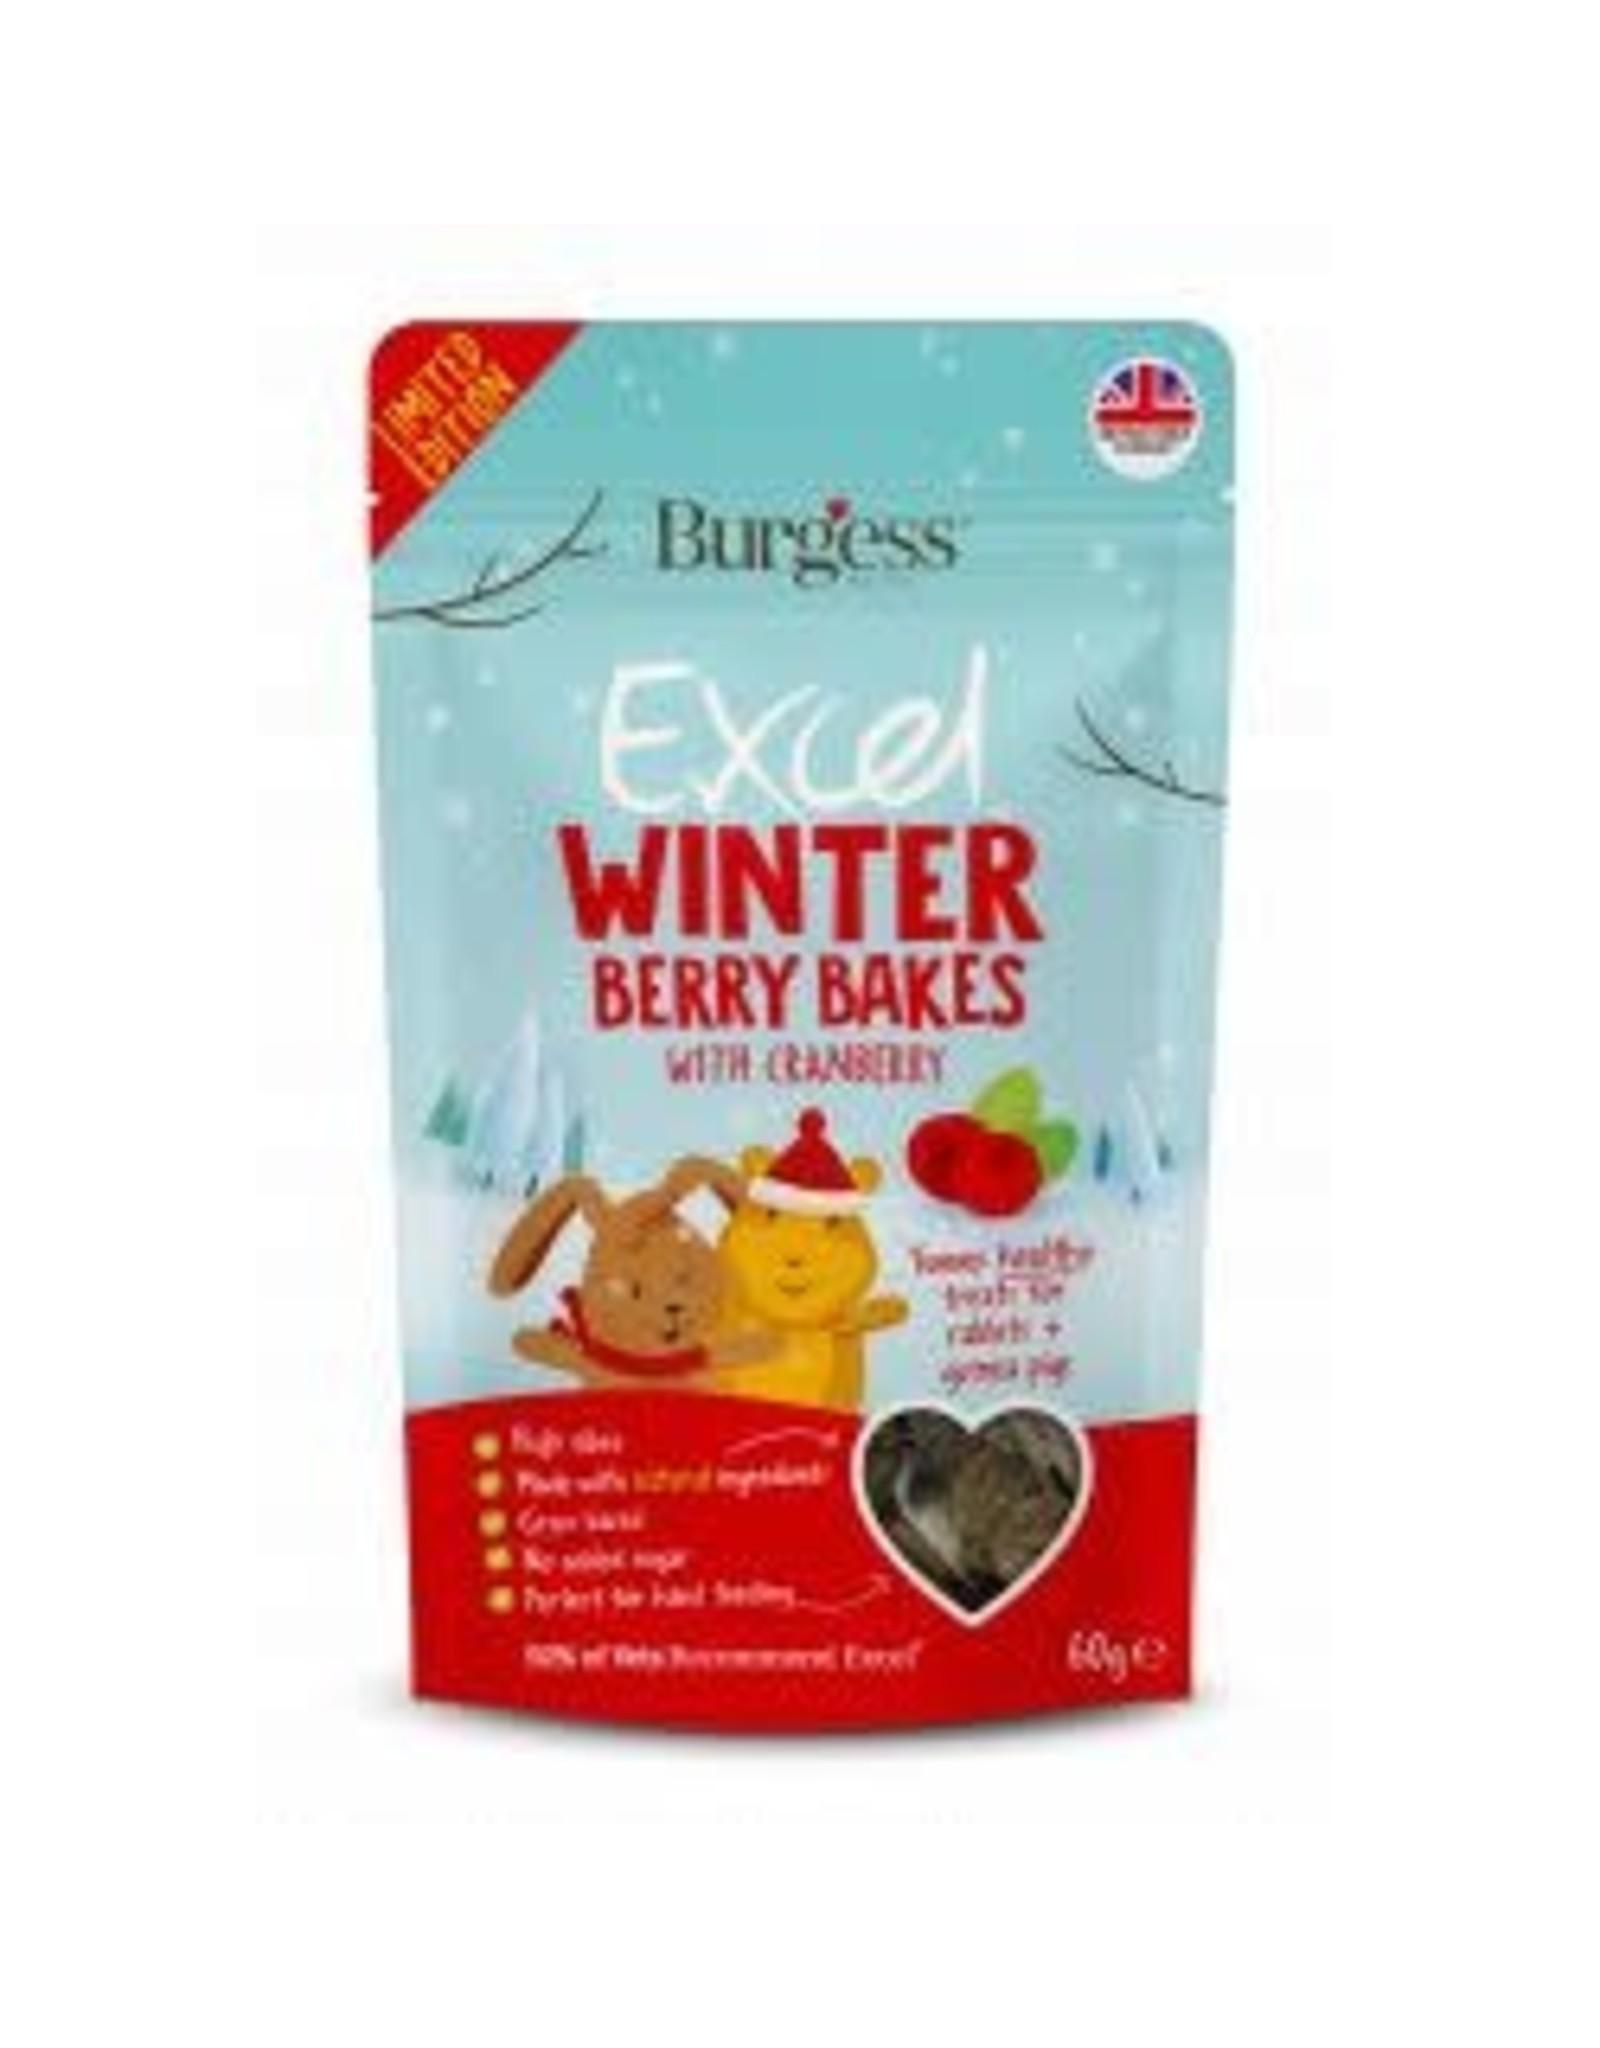 Burgess Burgess Excel Winter Berry Bakes 60g